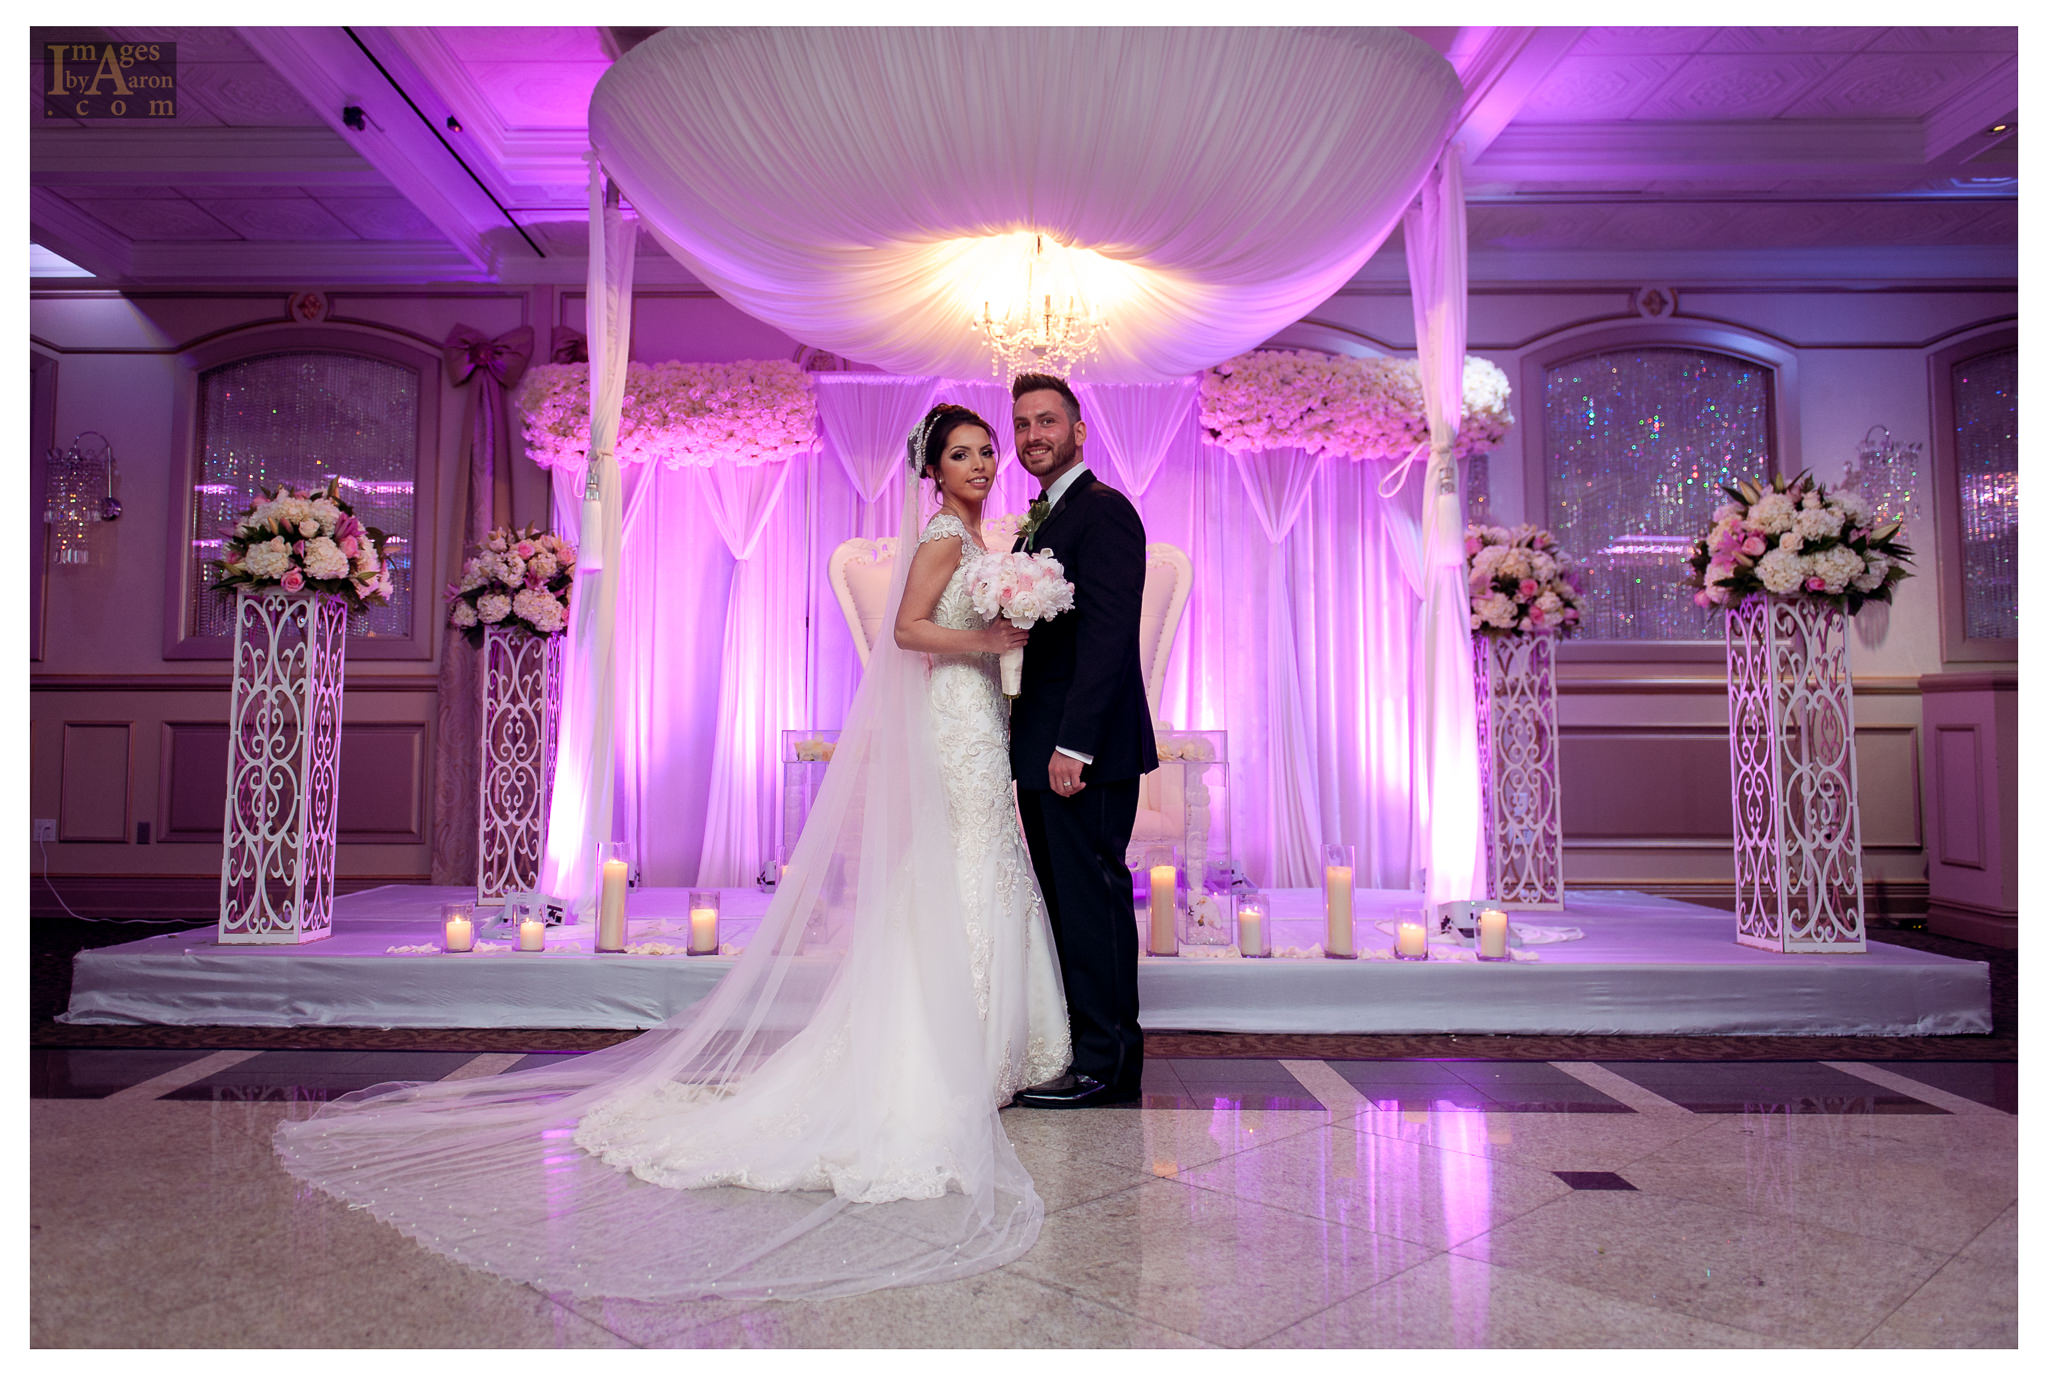 Gokce Turkish Wedding Reception New York Photographer Wedding Photography The Royal Manor-5.jpg